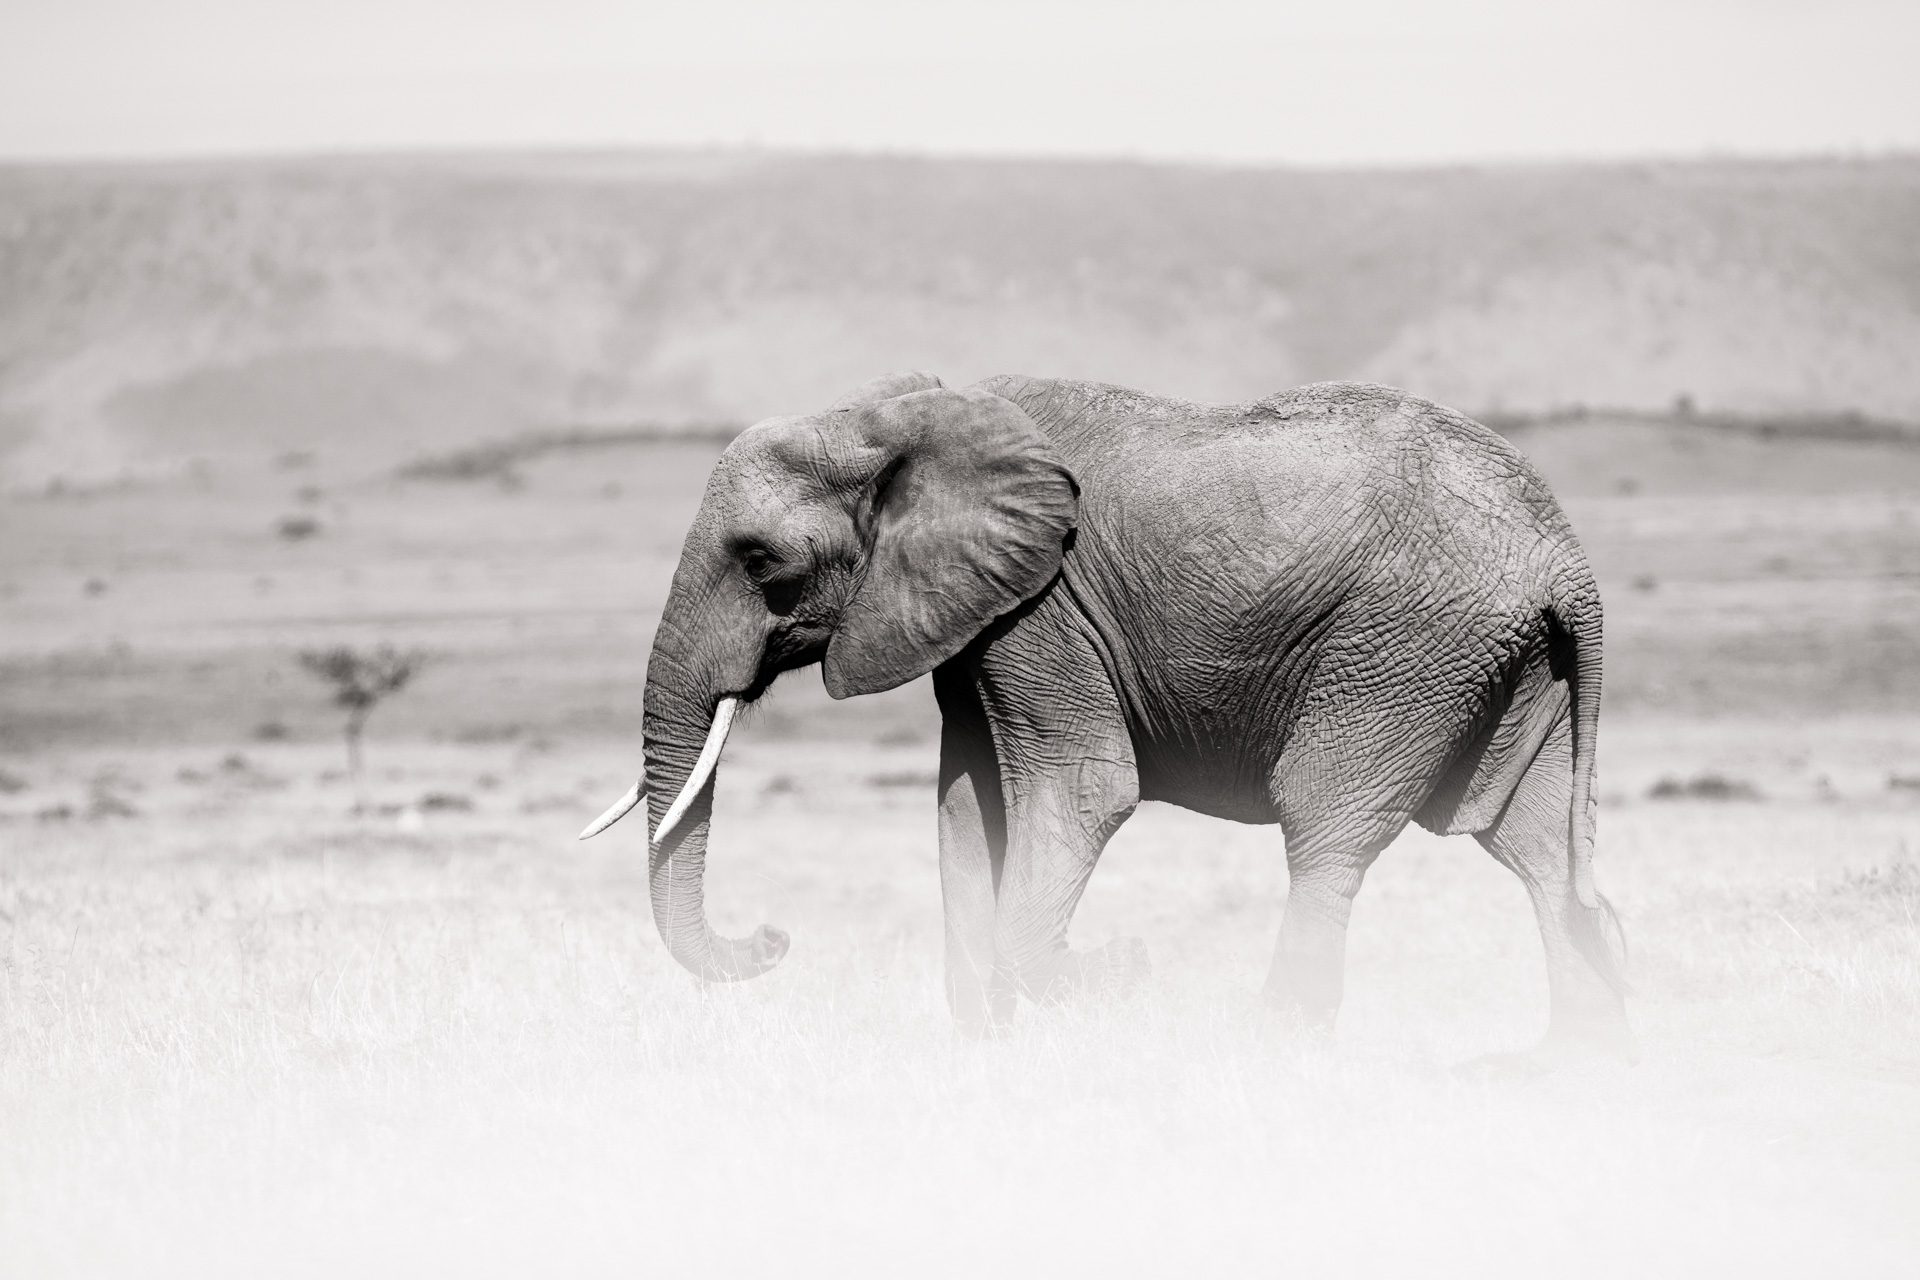 Elephant in white